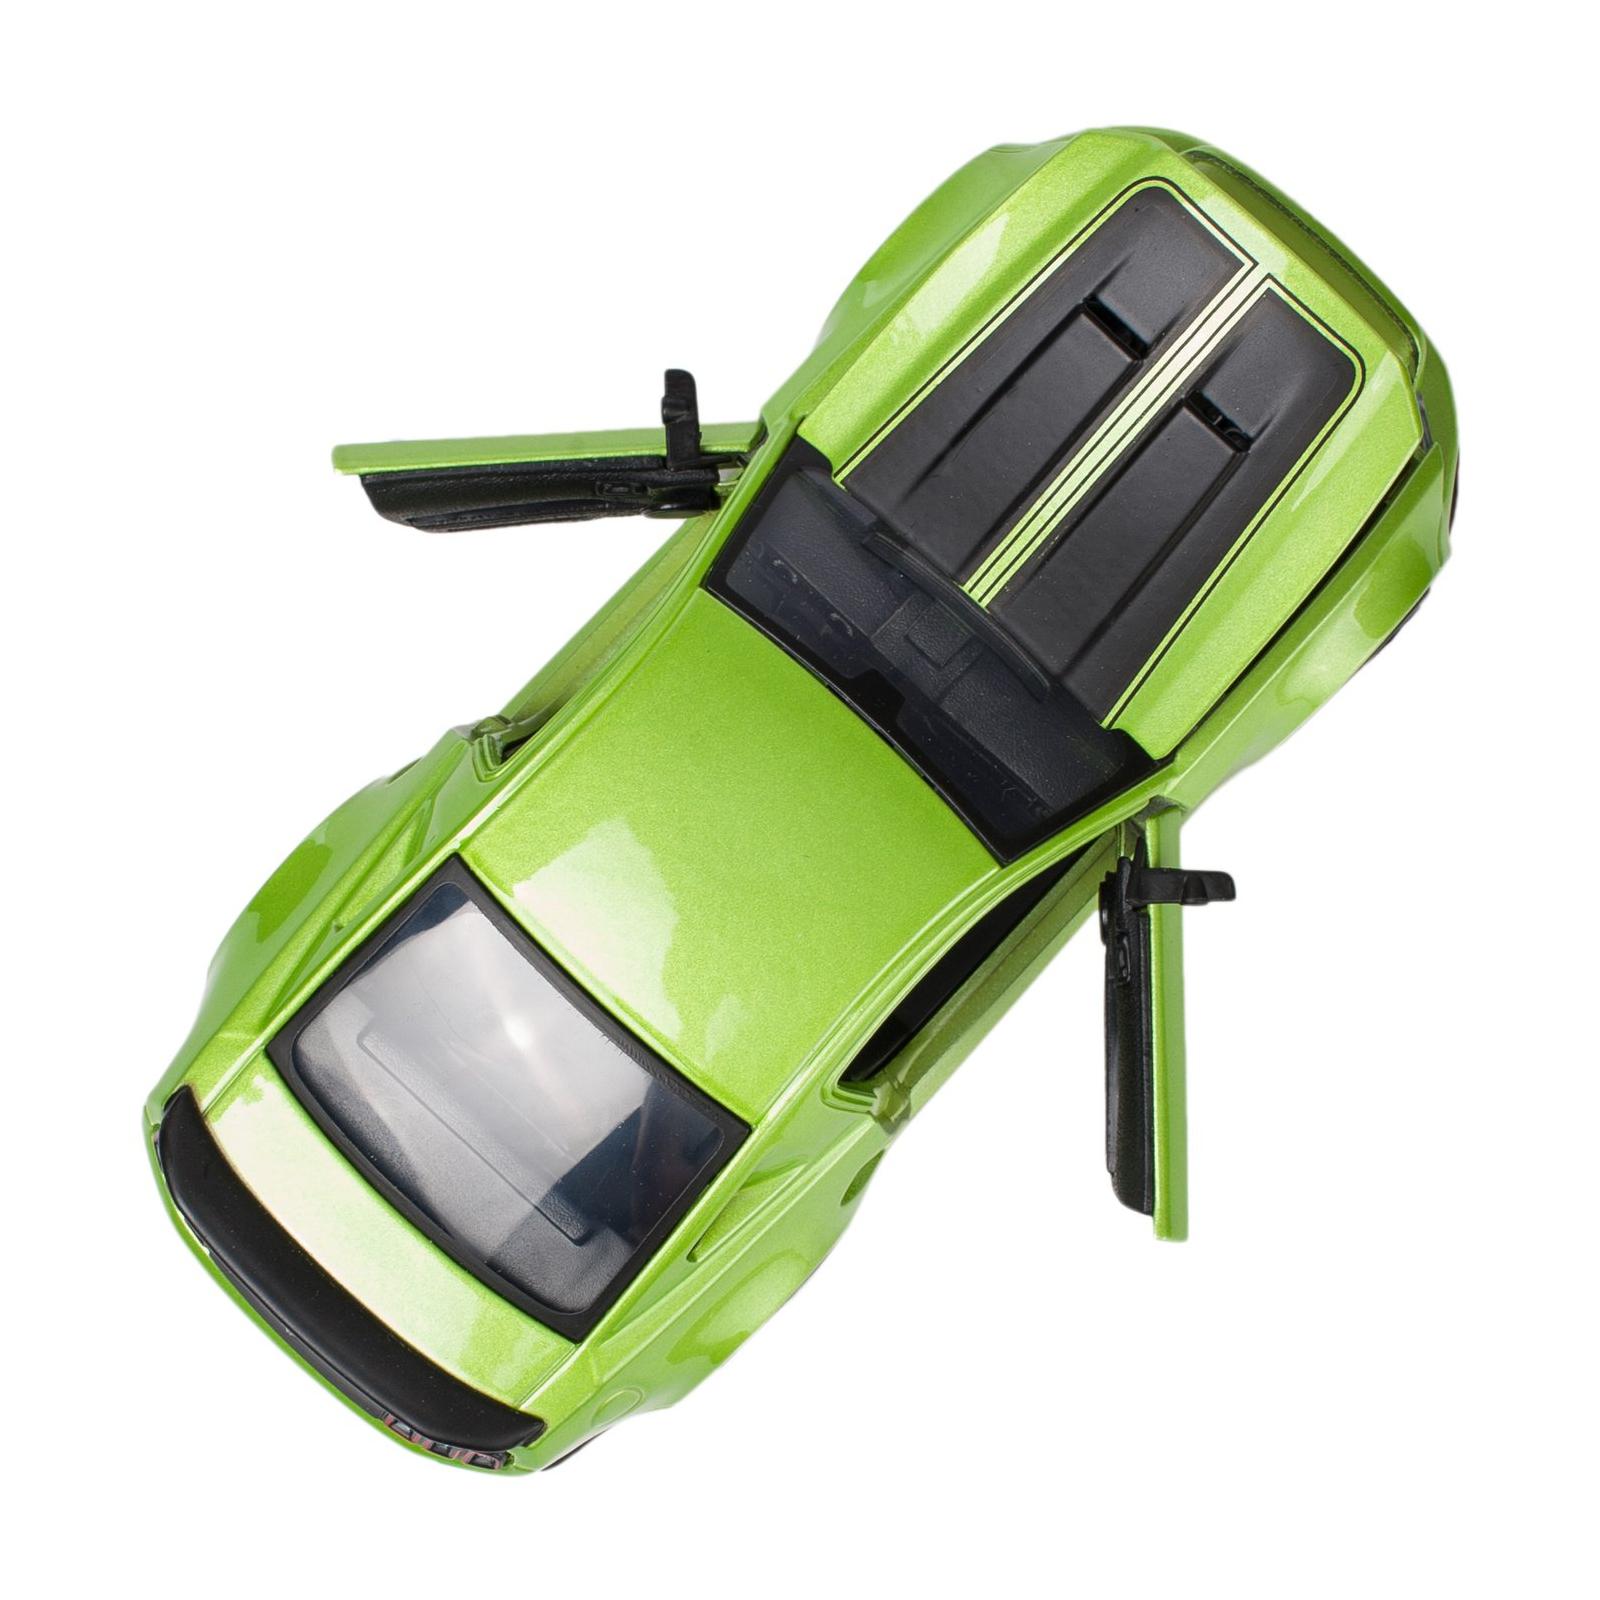 Машина Maisto Ford Mustang Street Racer 2014 (1:24) зеленый металлик (31506 met. green) изображение 4